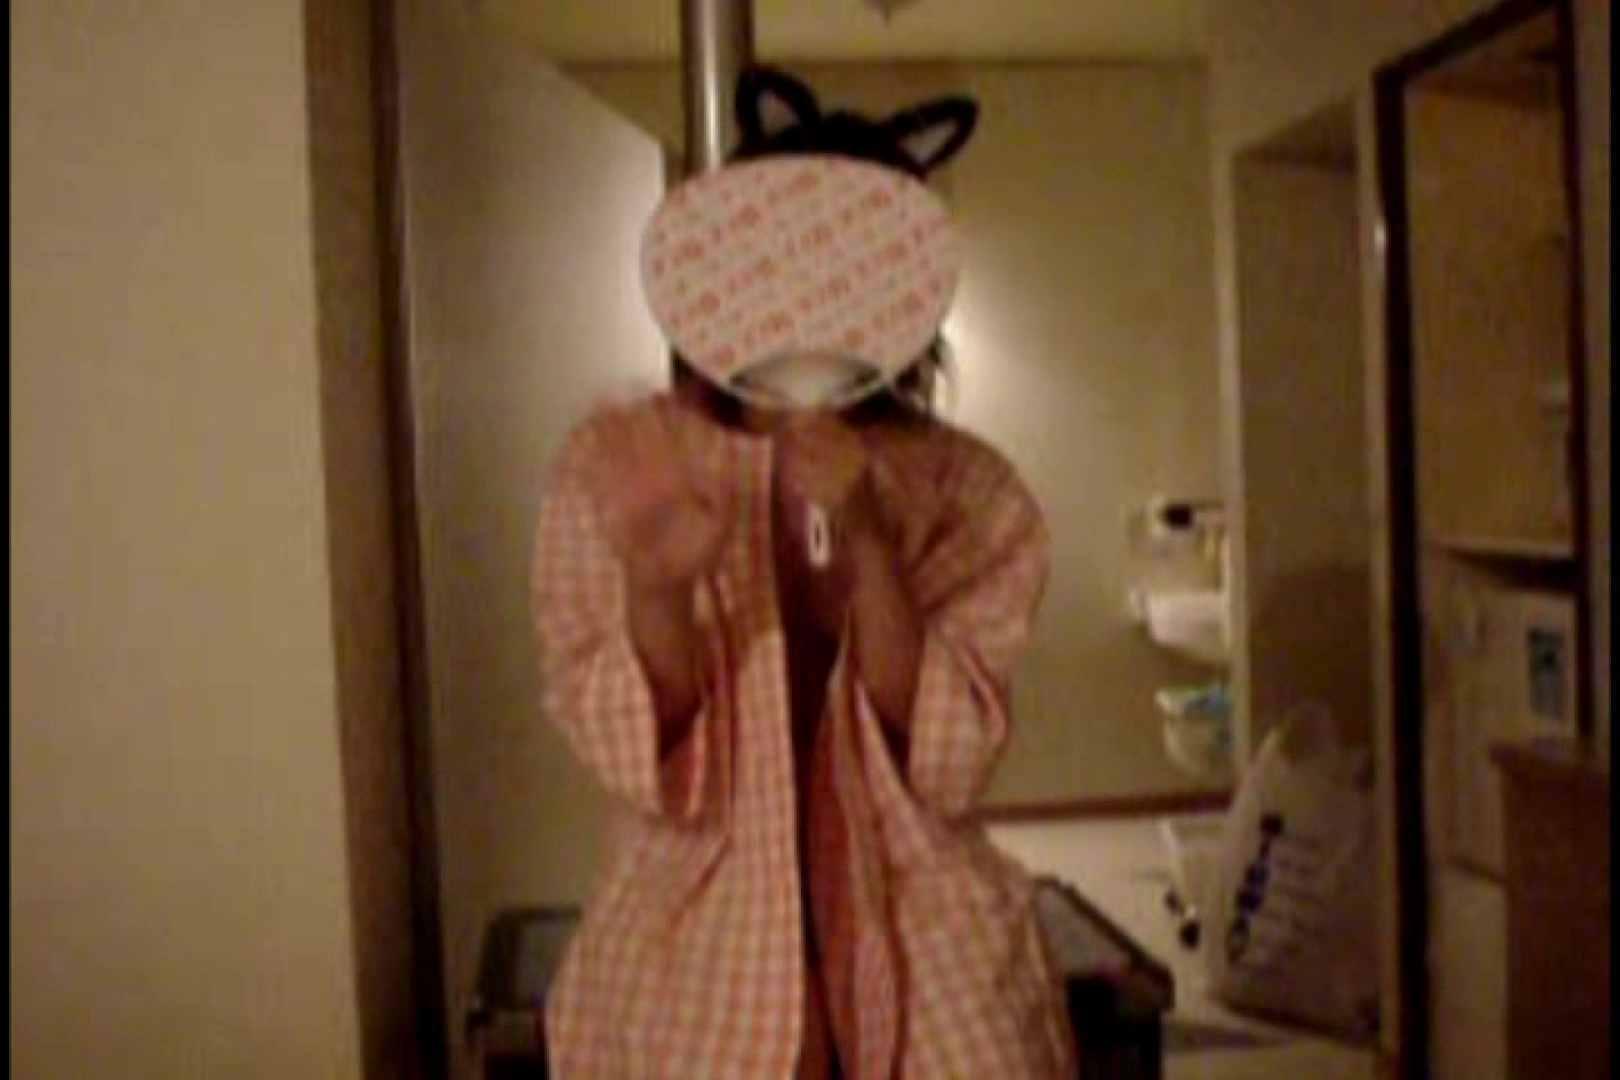 ウイルス流出 九州工学部女子大生藤野瑠美 超エロ女子大生  109枚 94